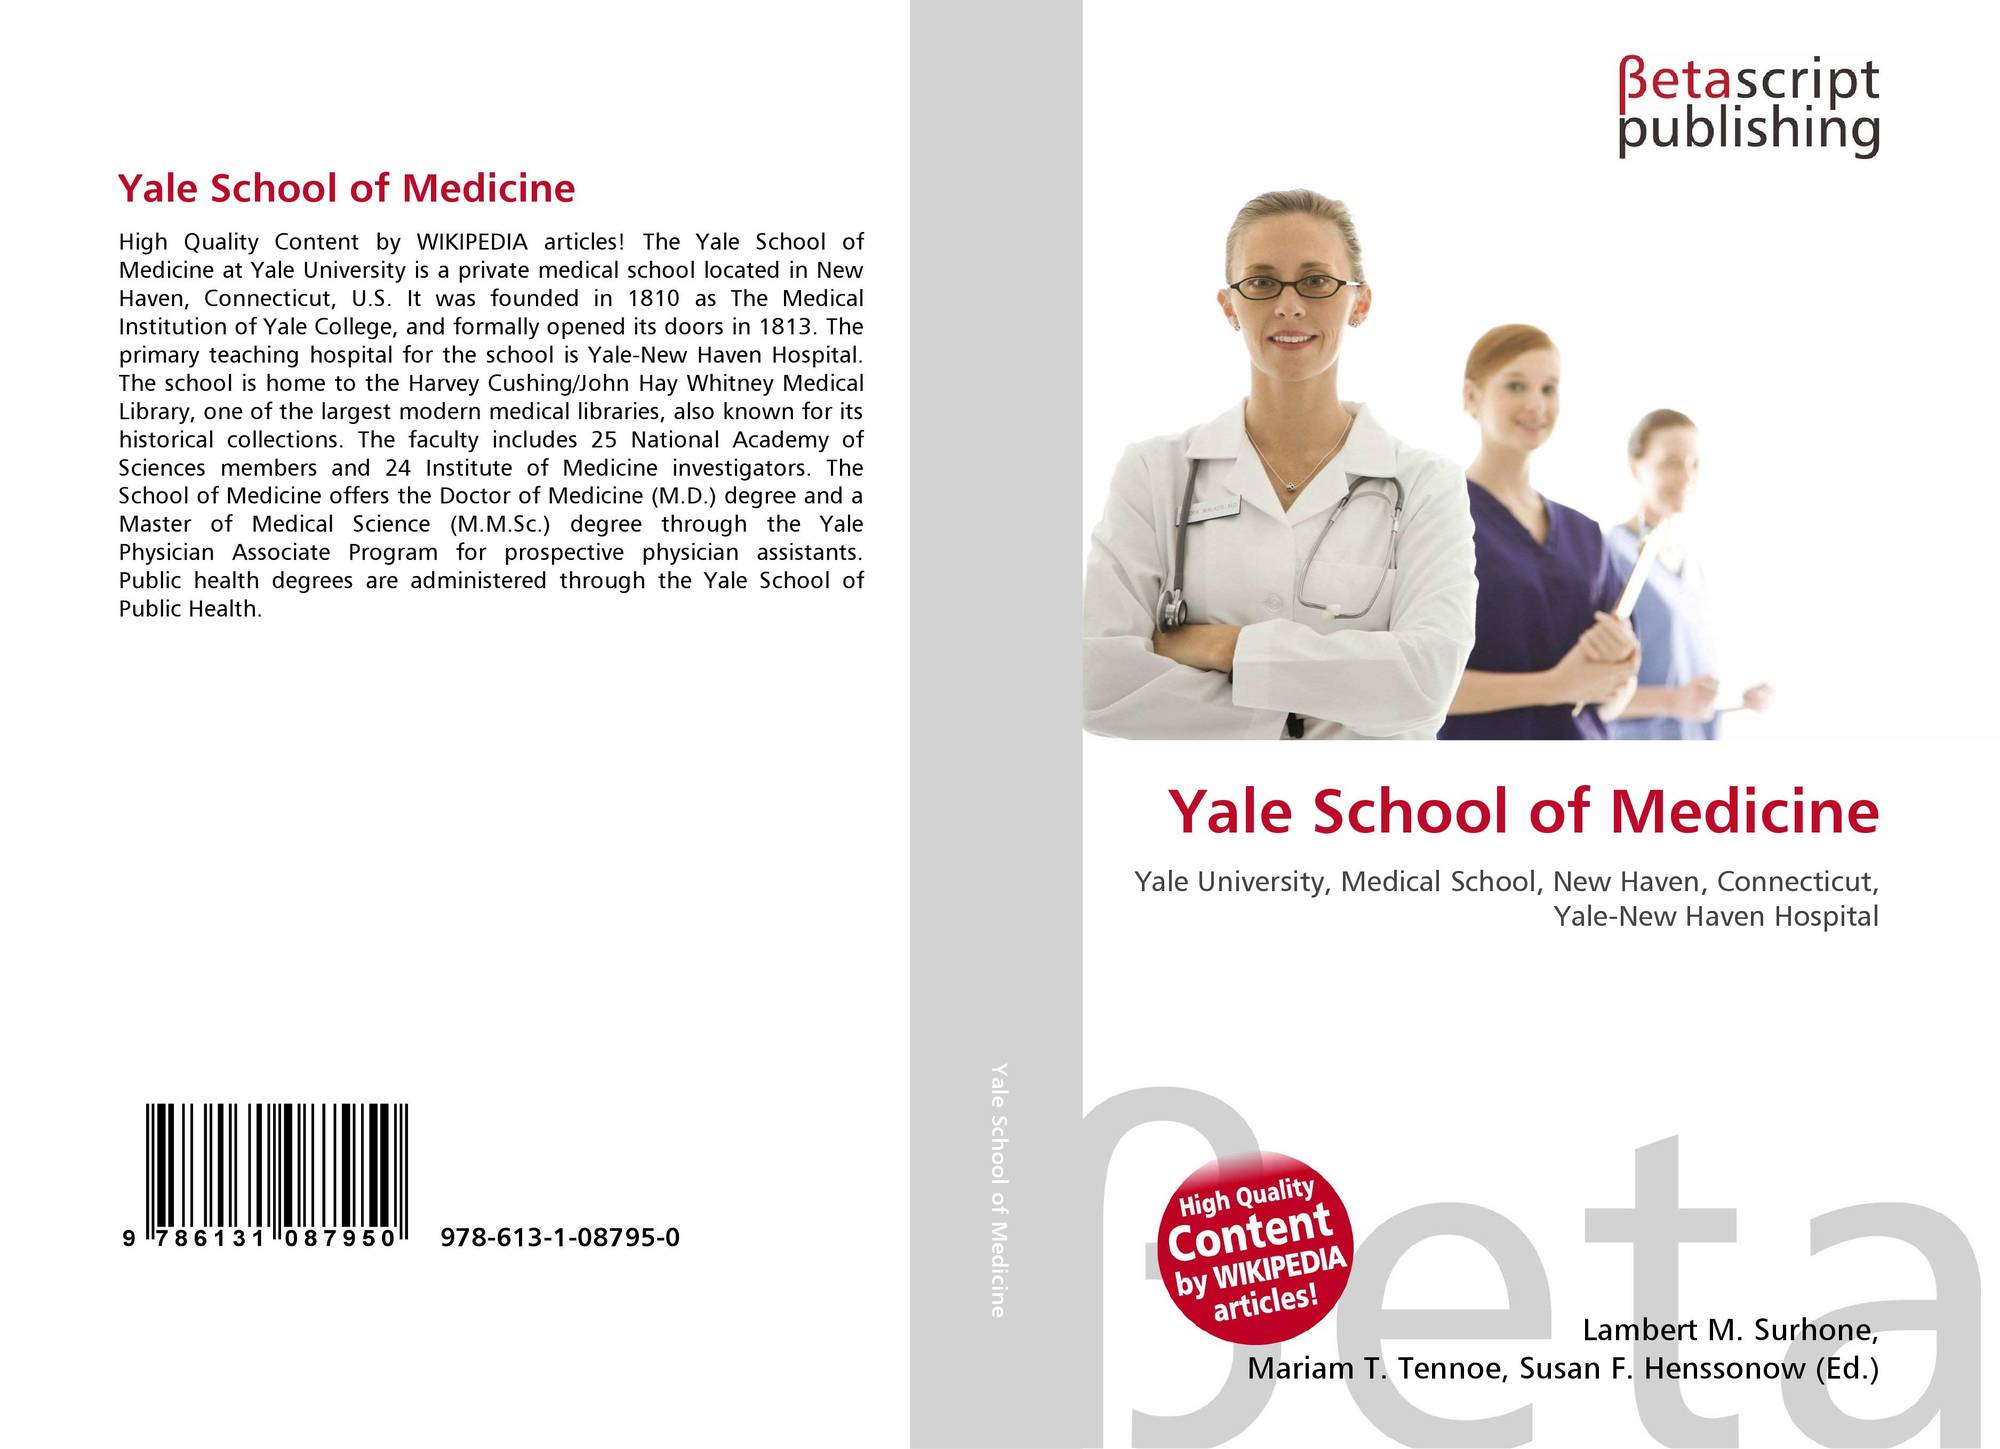 Yale School of Medicine, 978-613-1-08795-0, 6131087954